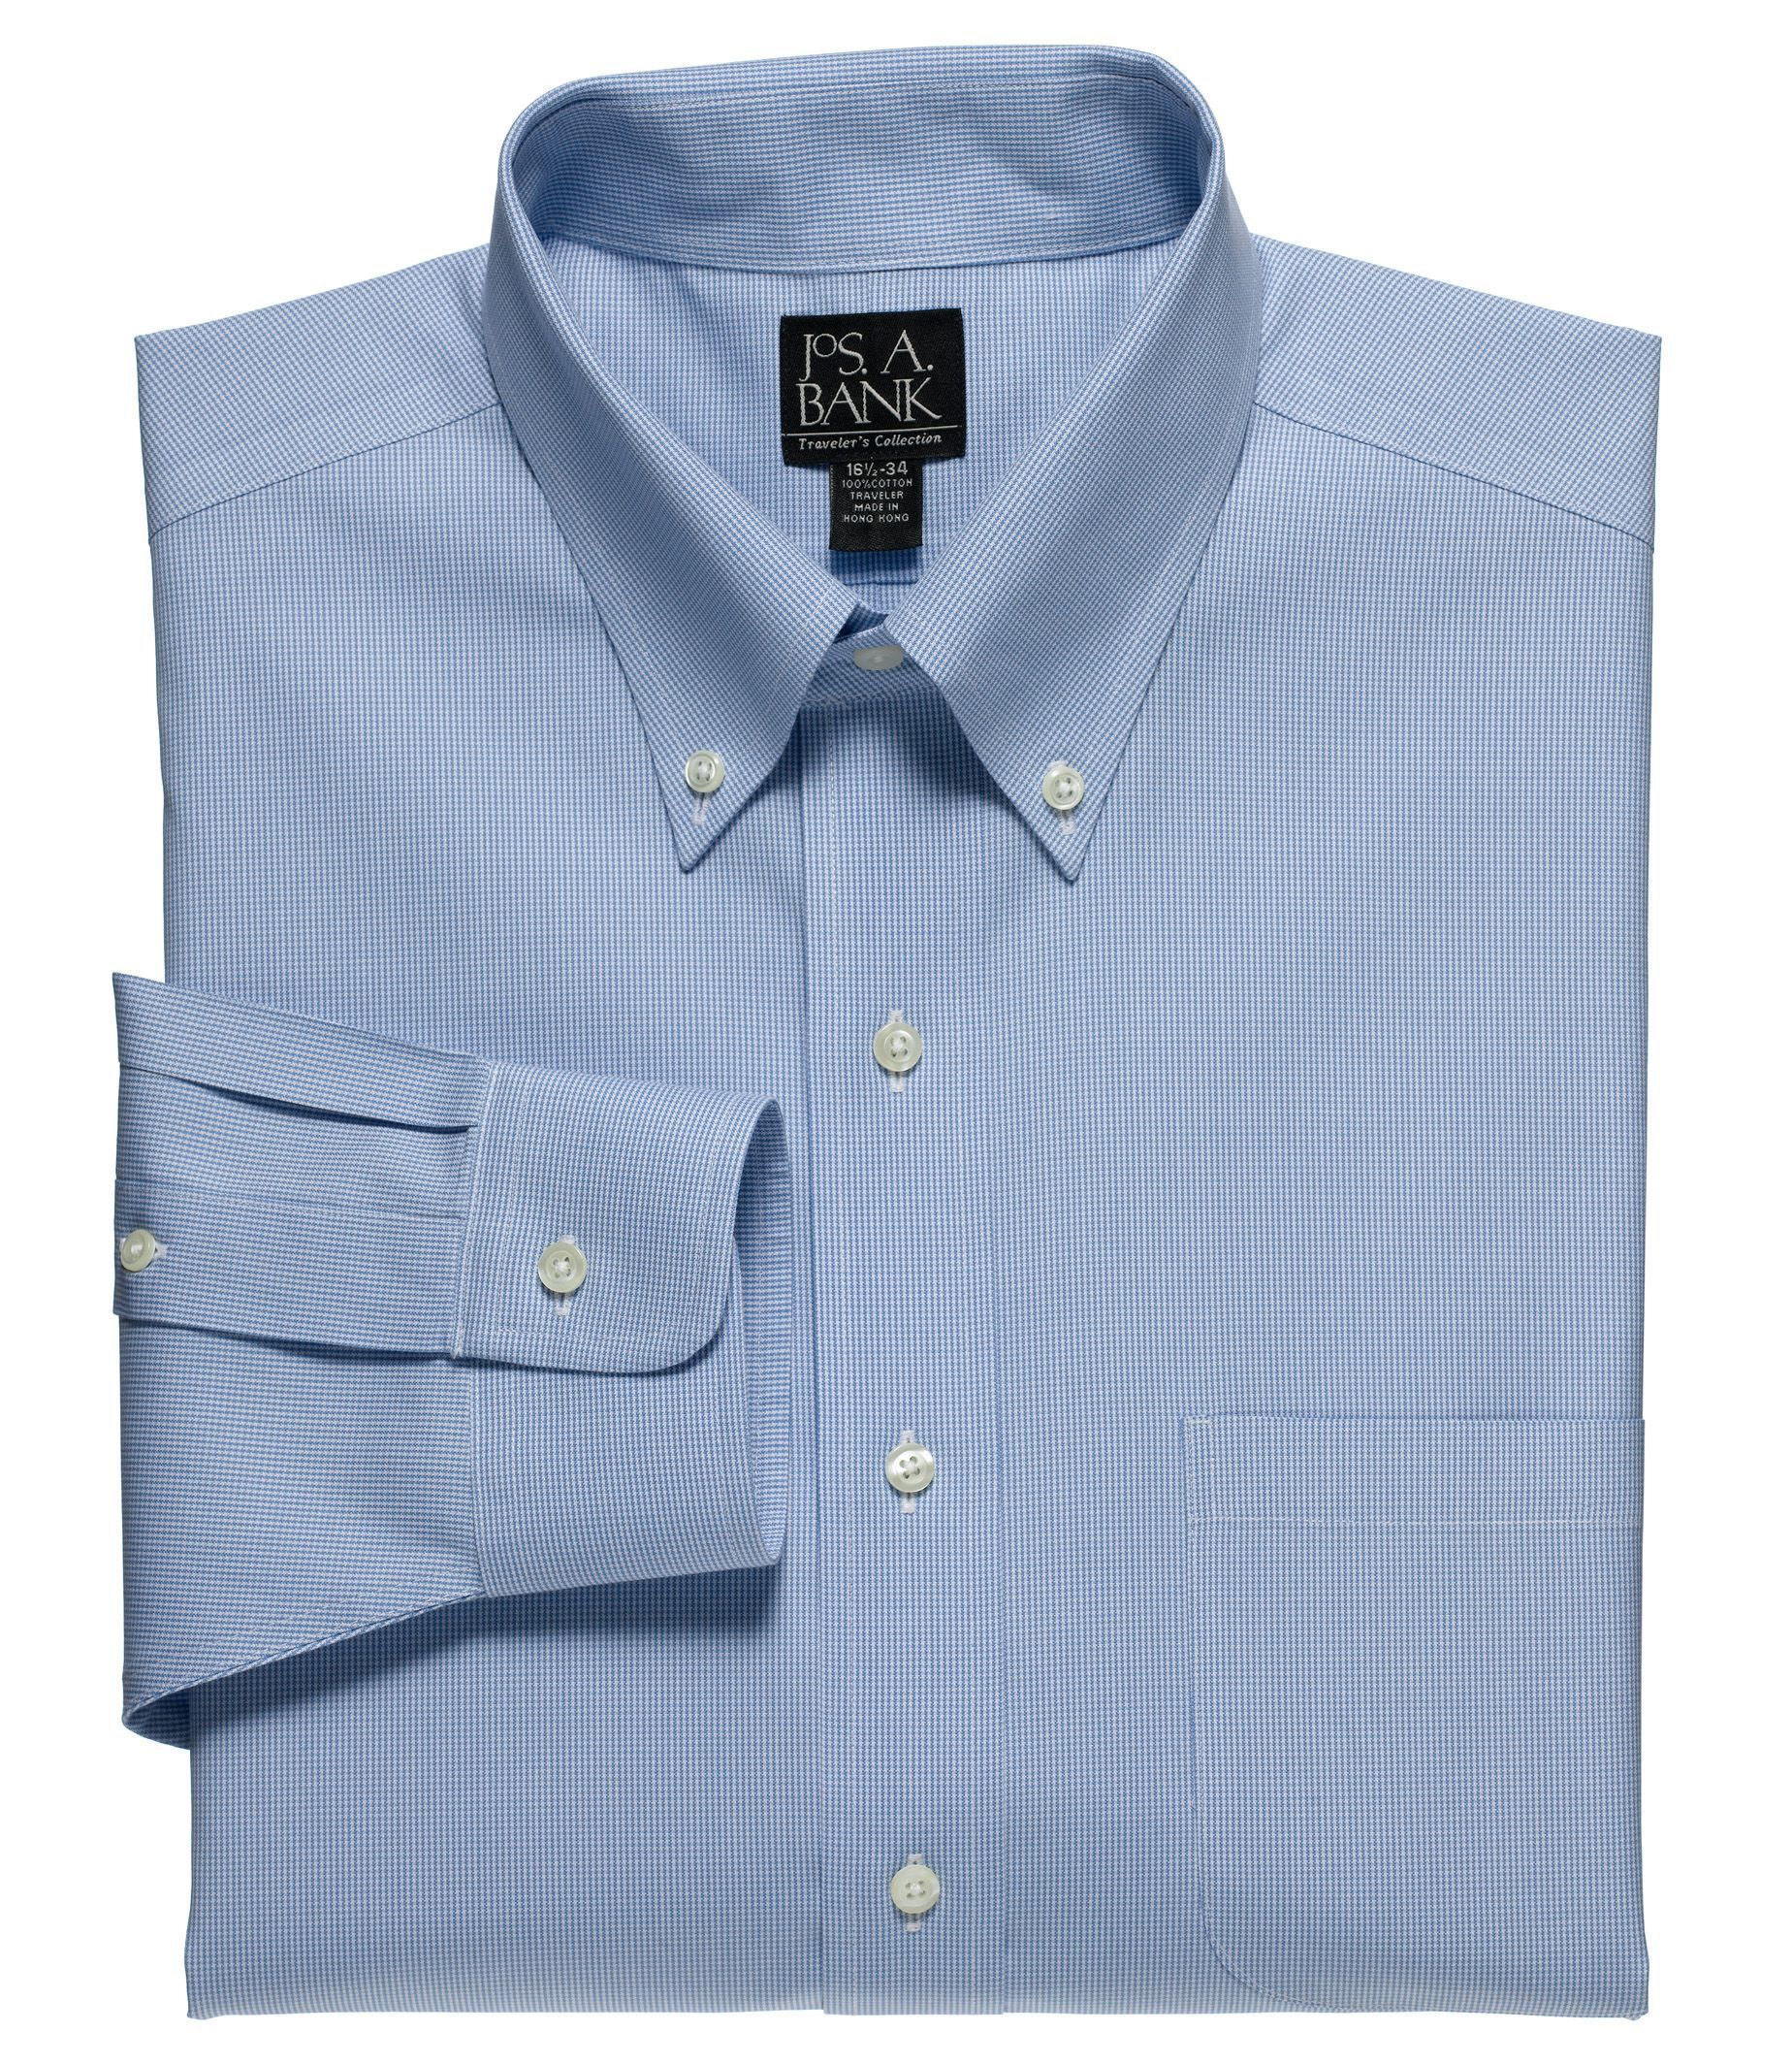 Traveler Wrinkle Free Slim Fit Buttondown Collar Dress Shirt.